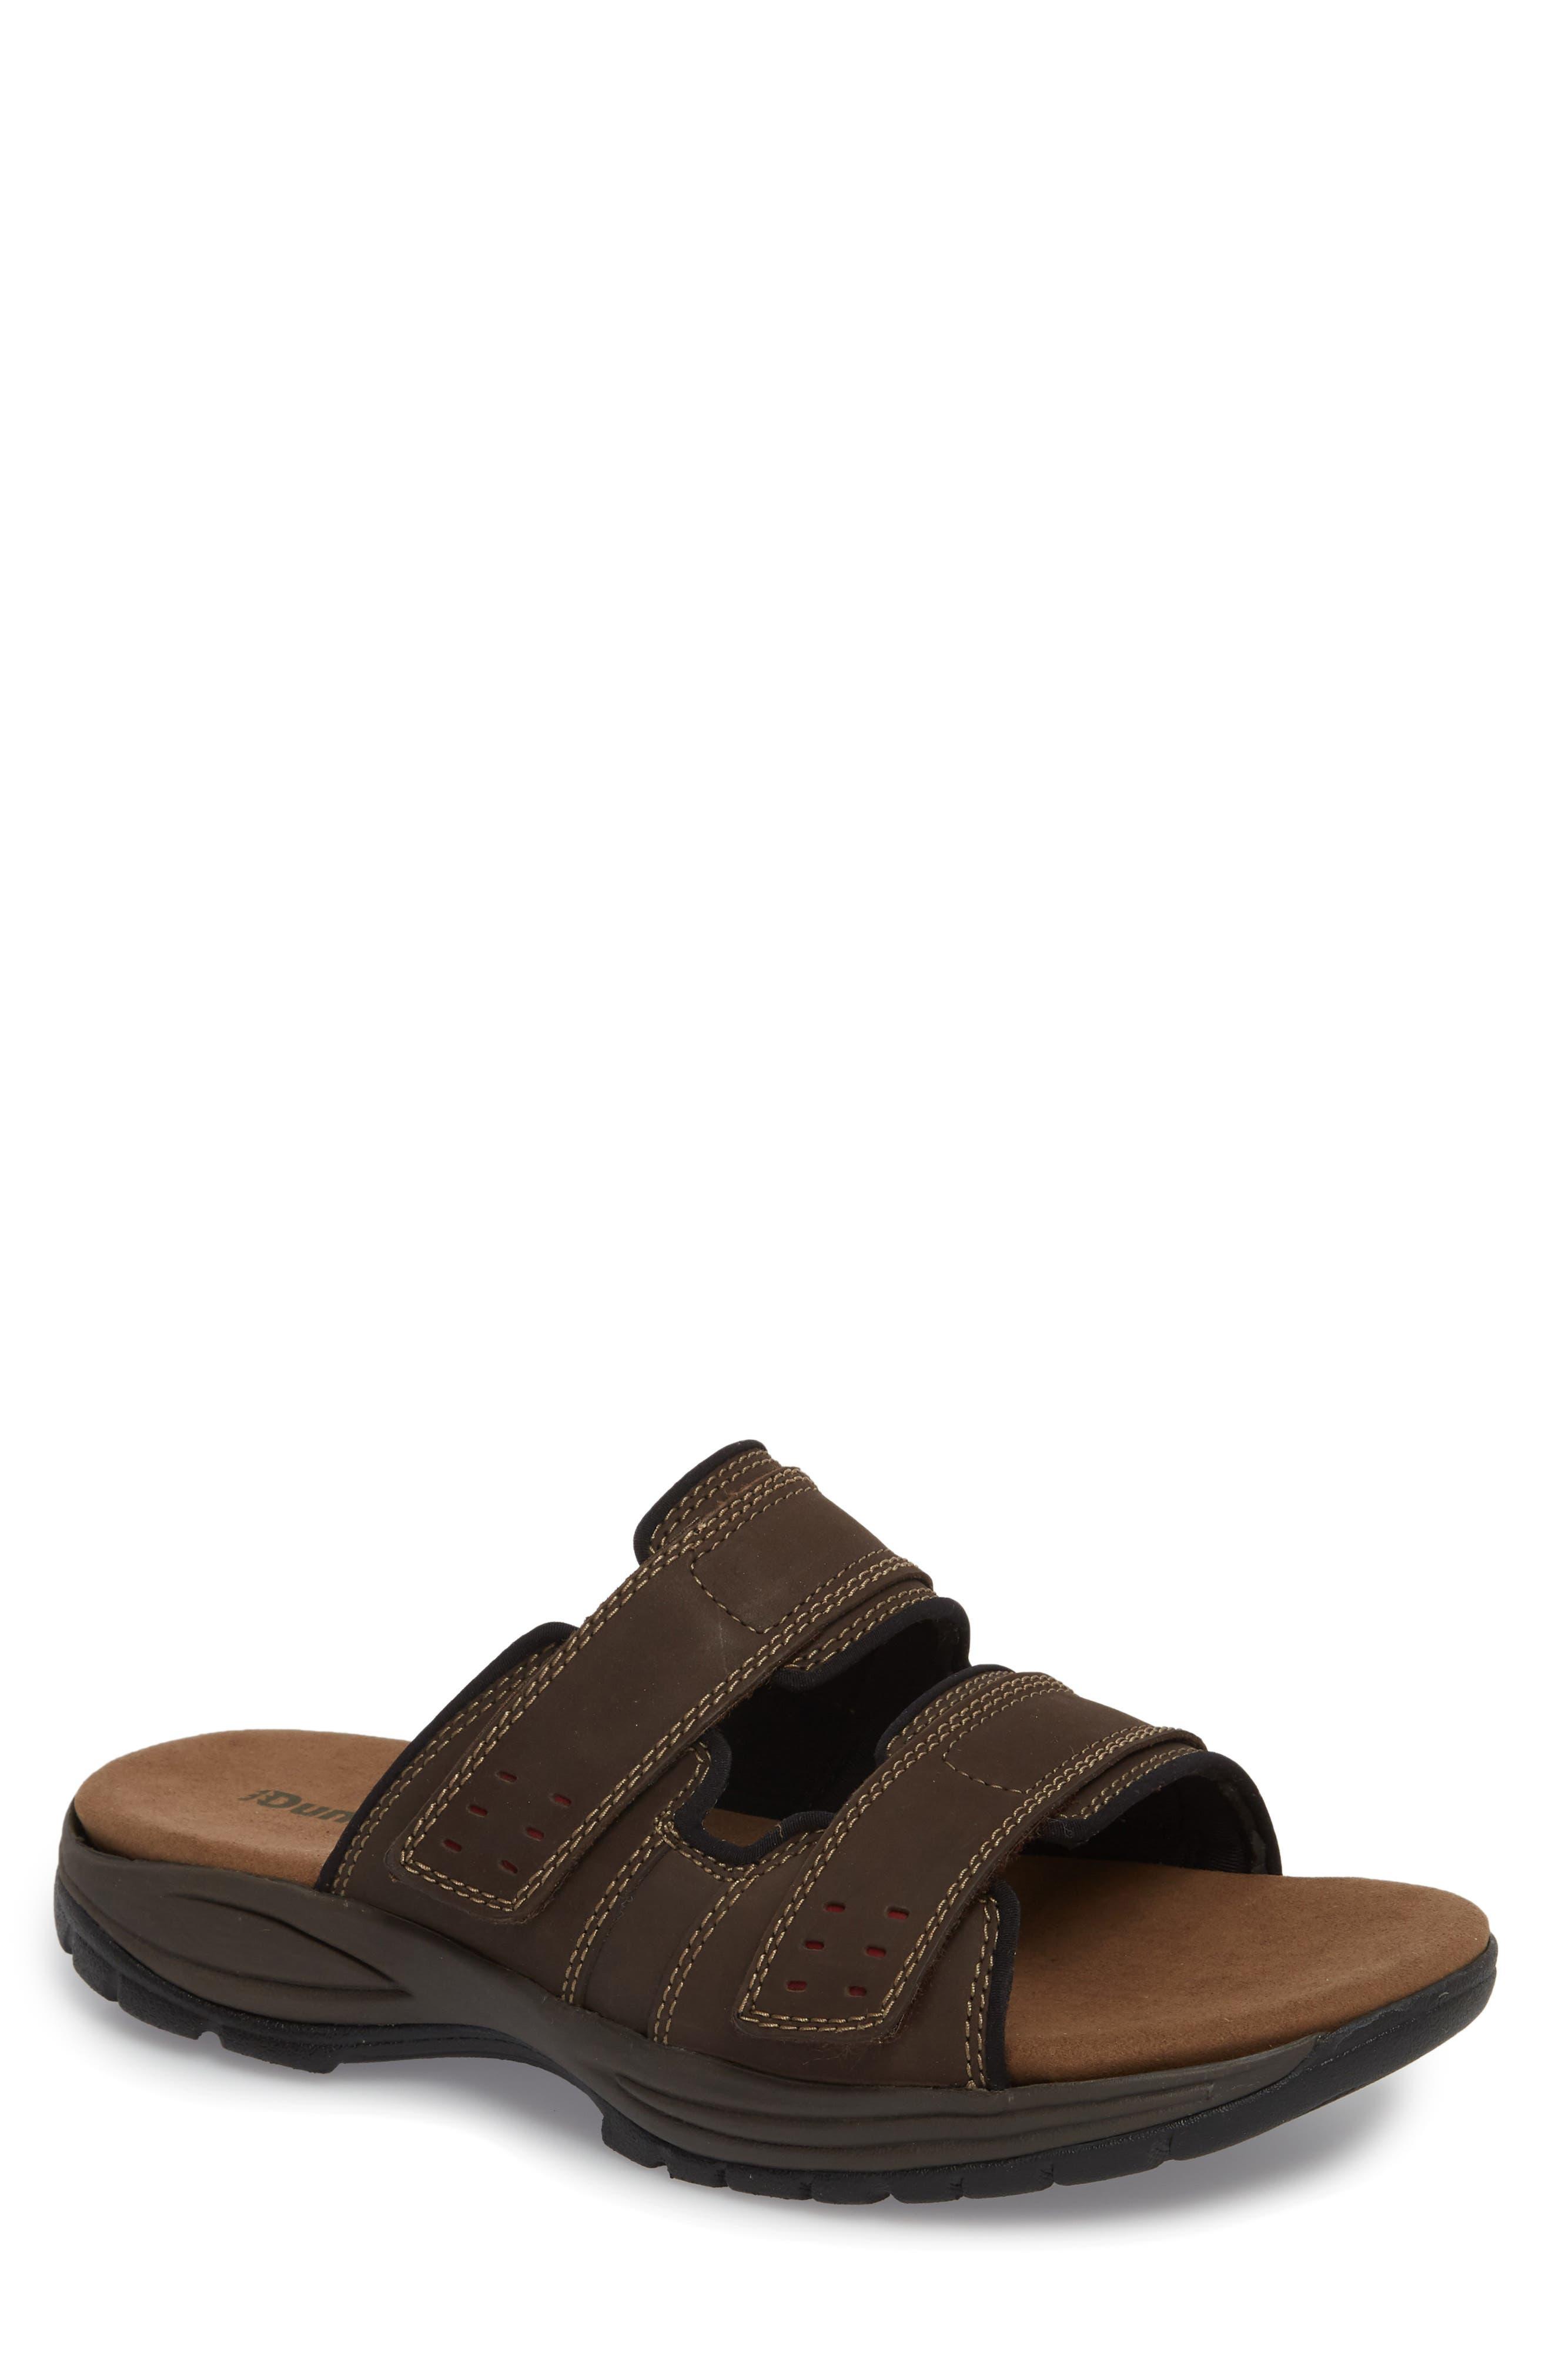 Newport Slide Sandal,                         Main,                         color, DARK BROWN LEATHER